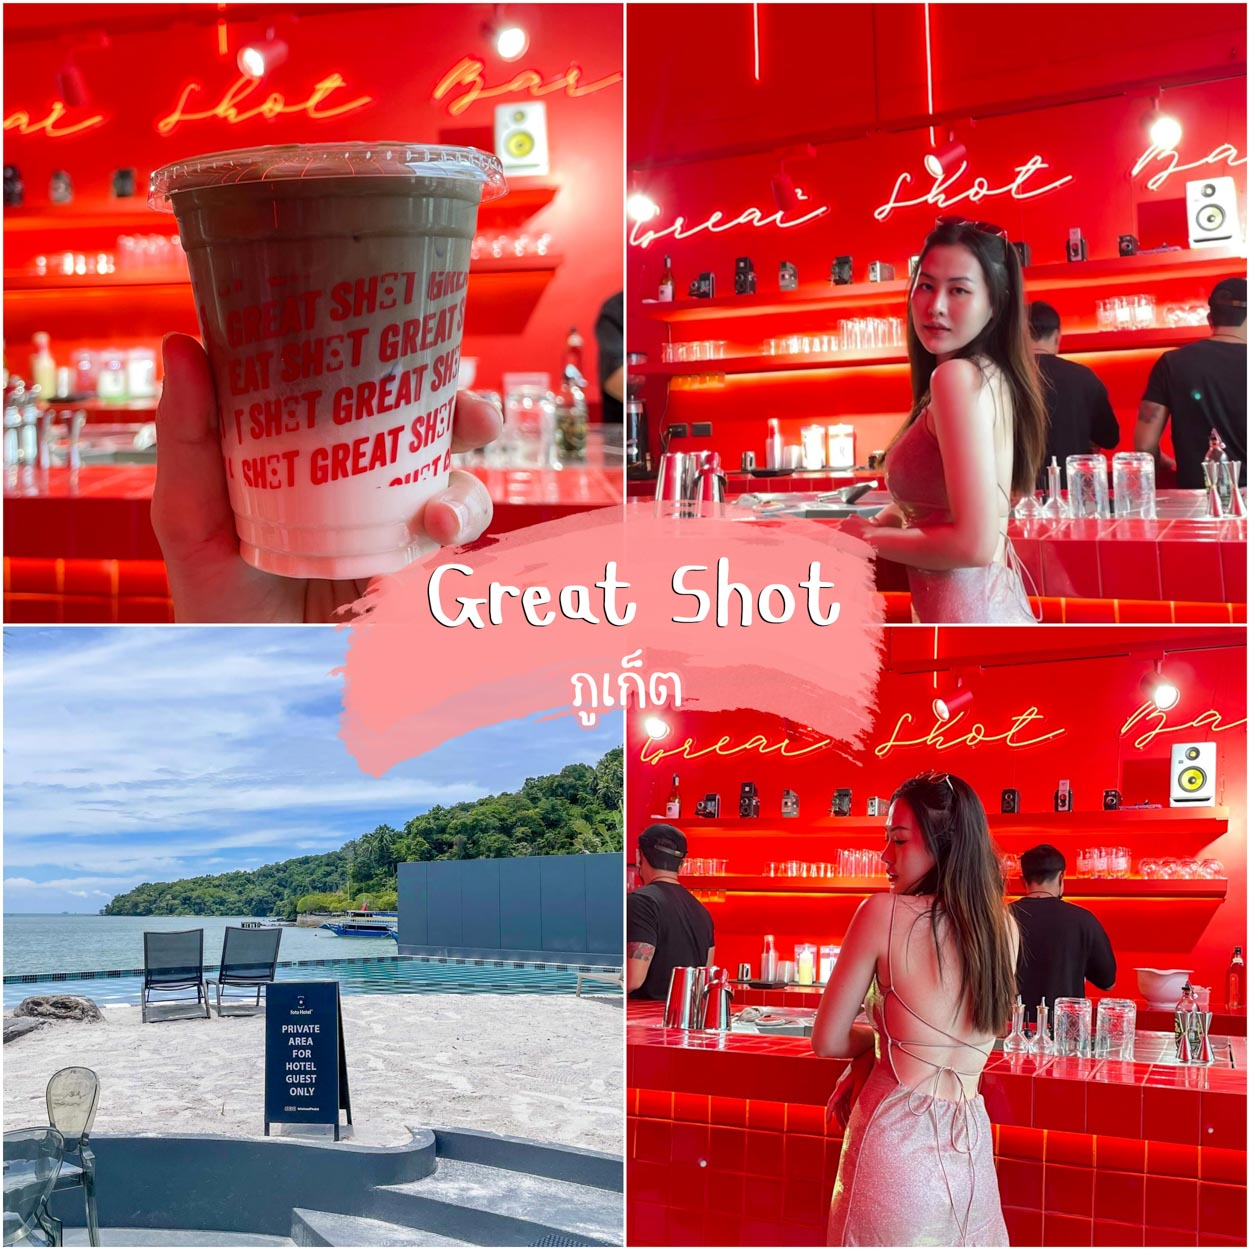 Great shot bar Phuket คาเฟ่ภูเก็ตลับๆ ห้องสีแดงแบบปังๆ โอ้ยสวยมากก